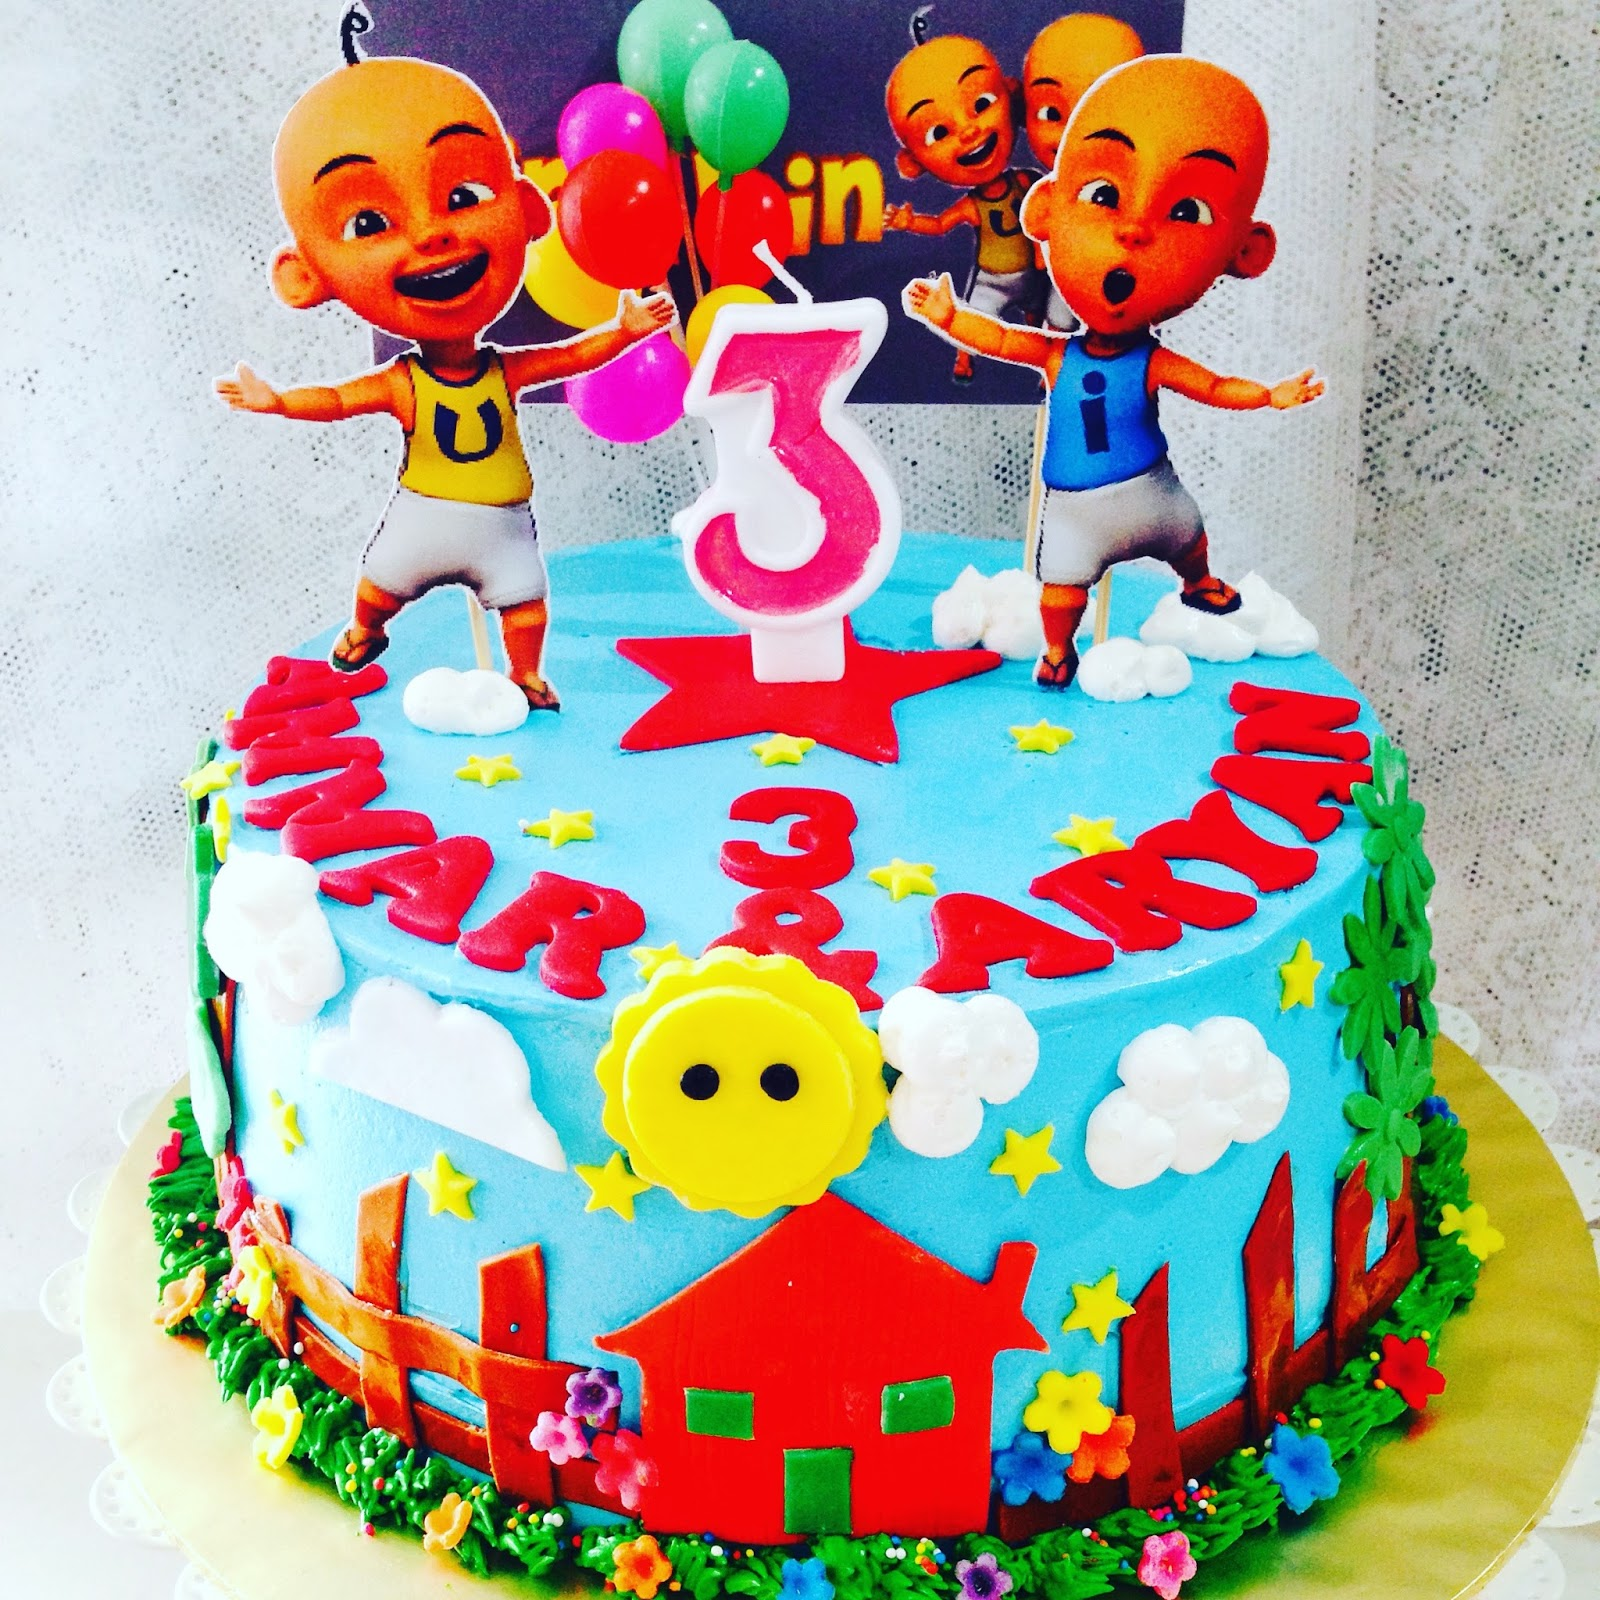 Design Cake Upin Ipin Bjaydev for